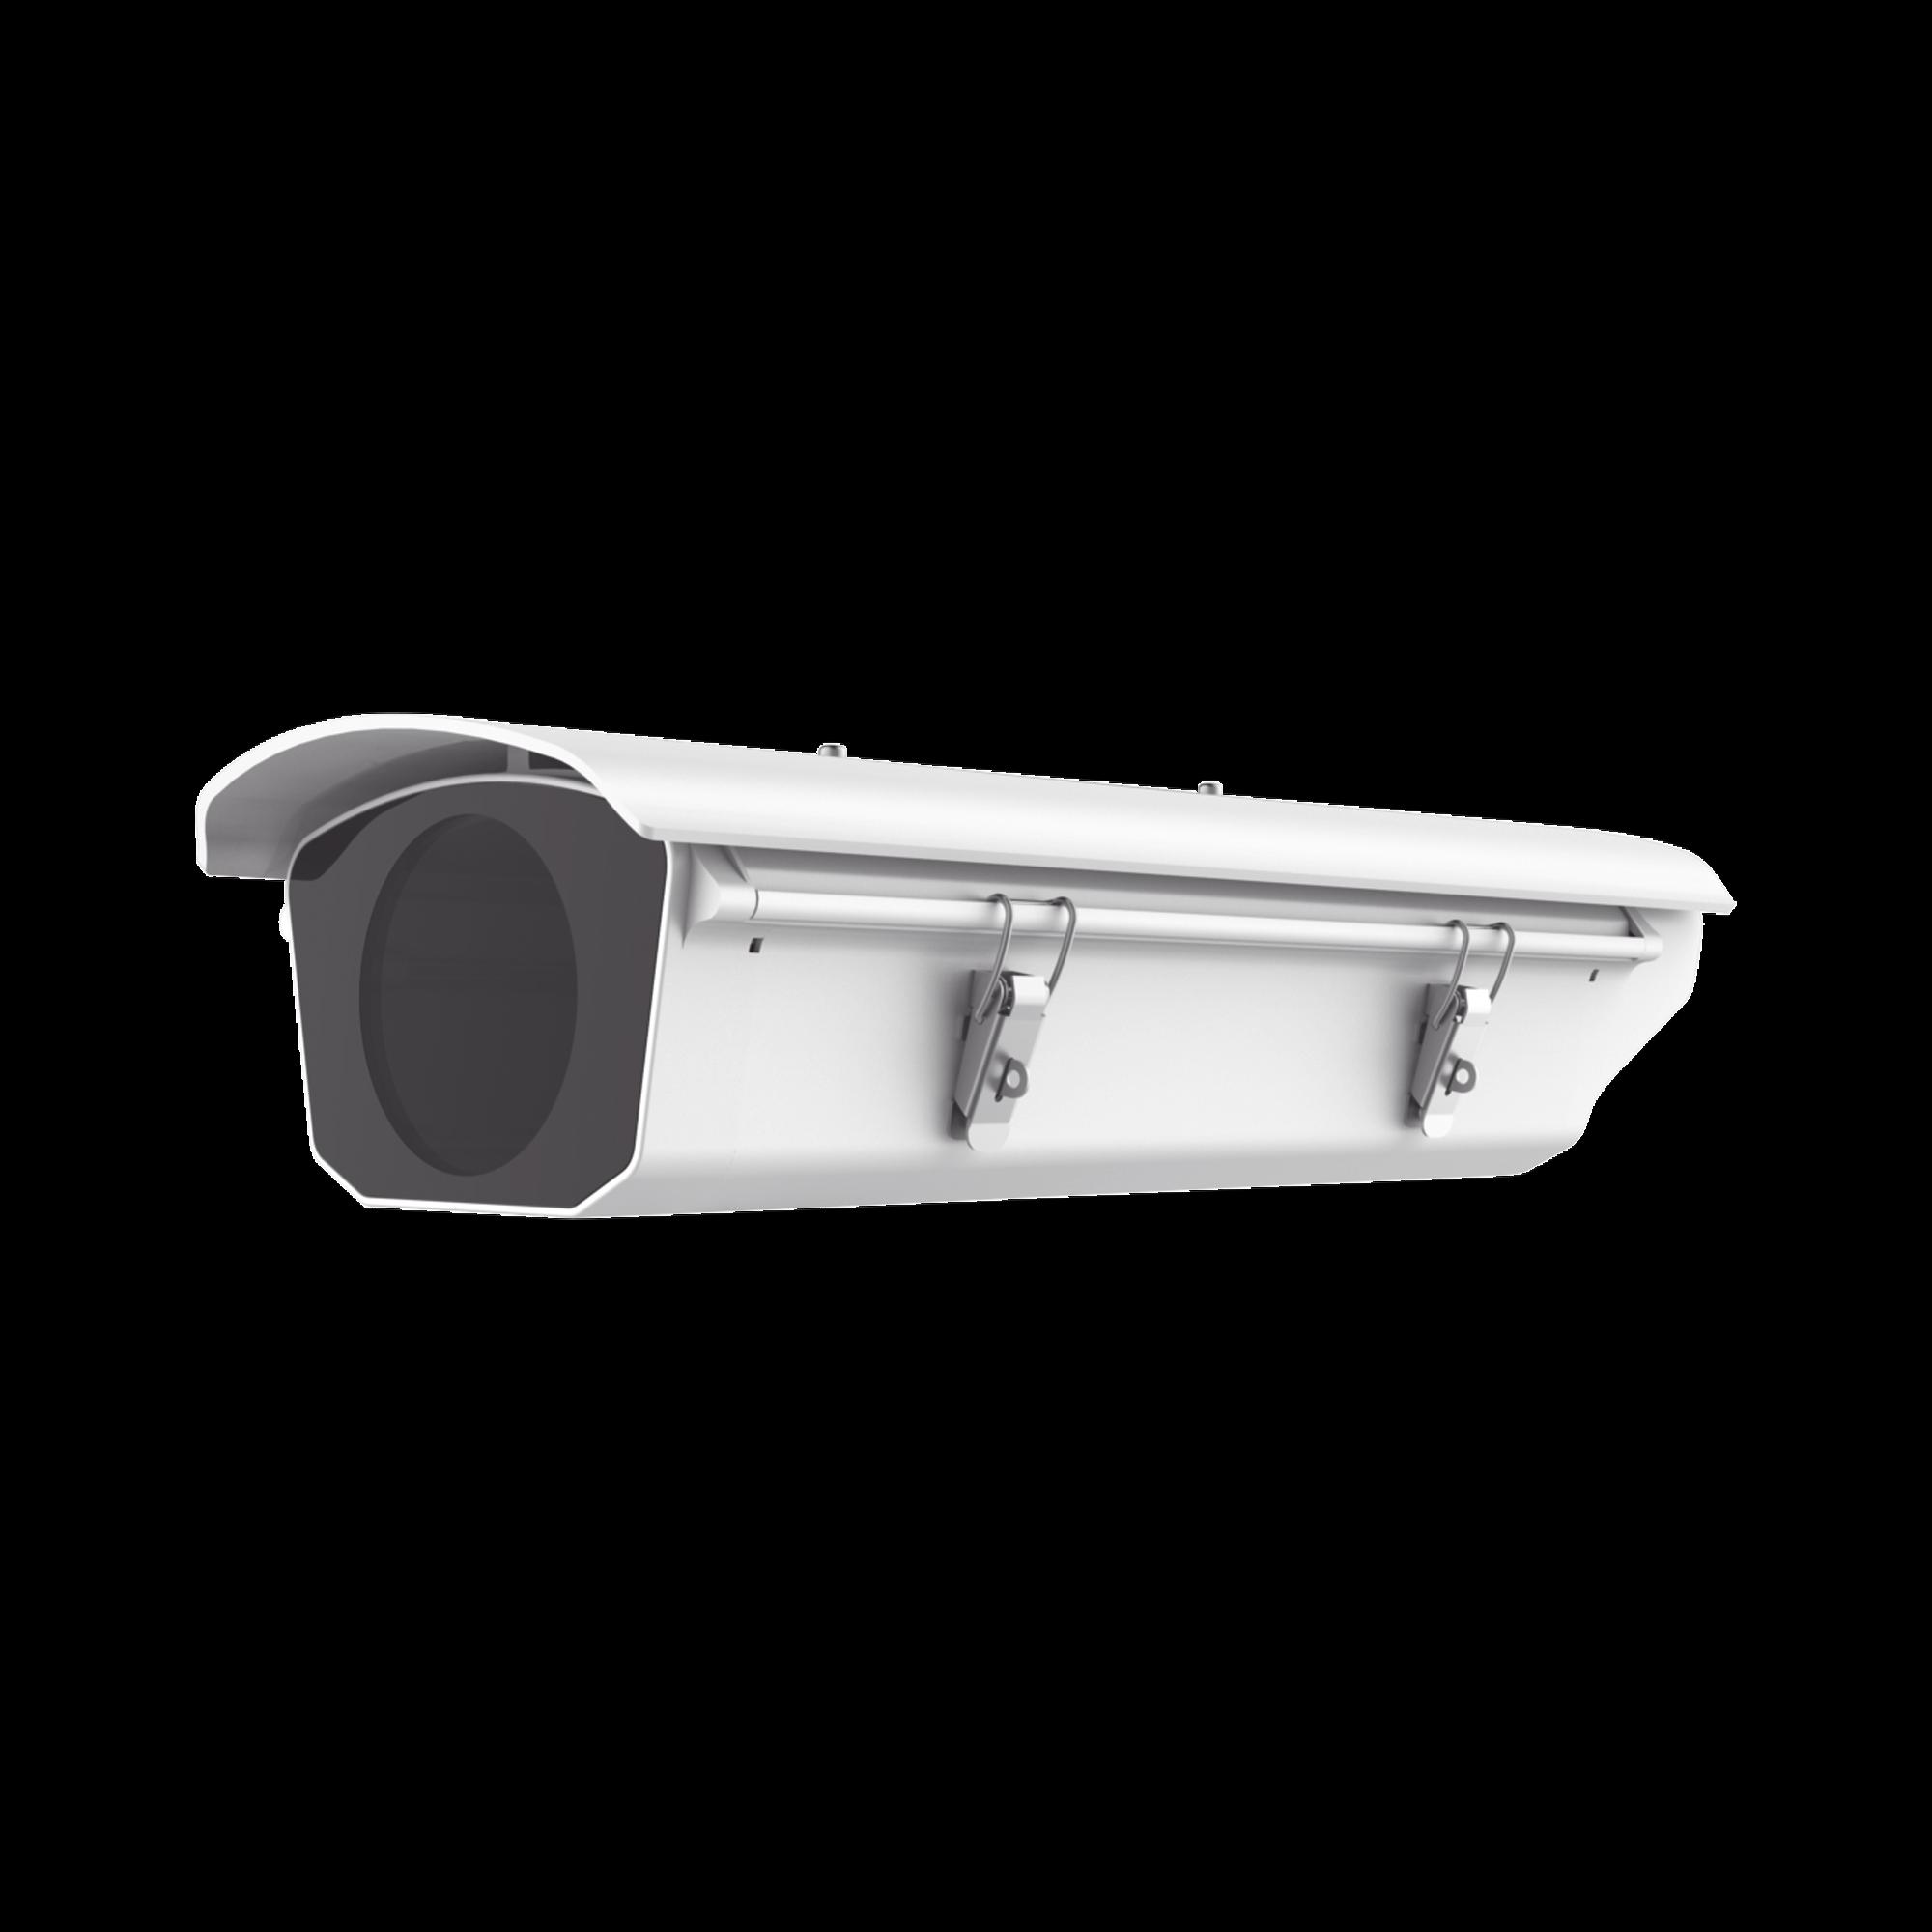 Gabinete para cámaras tipo BOX (Profesional) / Exterior IP67 / Ventilador Integrado